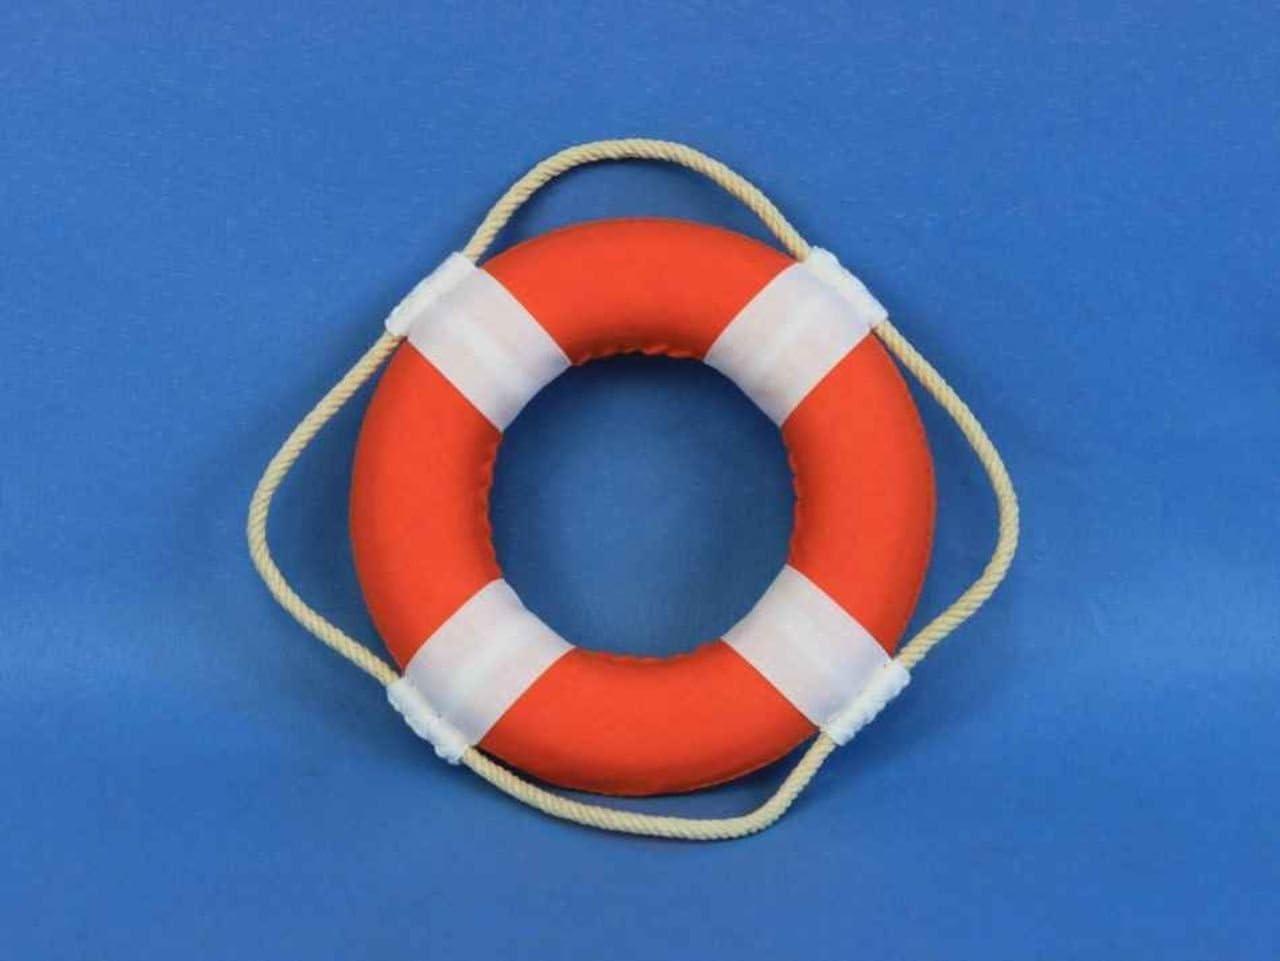 Orange//White 6 Hampton Nautical Vibrant with Bands Decorative Life Ring Beach Decorating Ideas Accessories